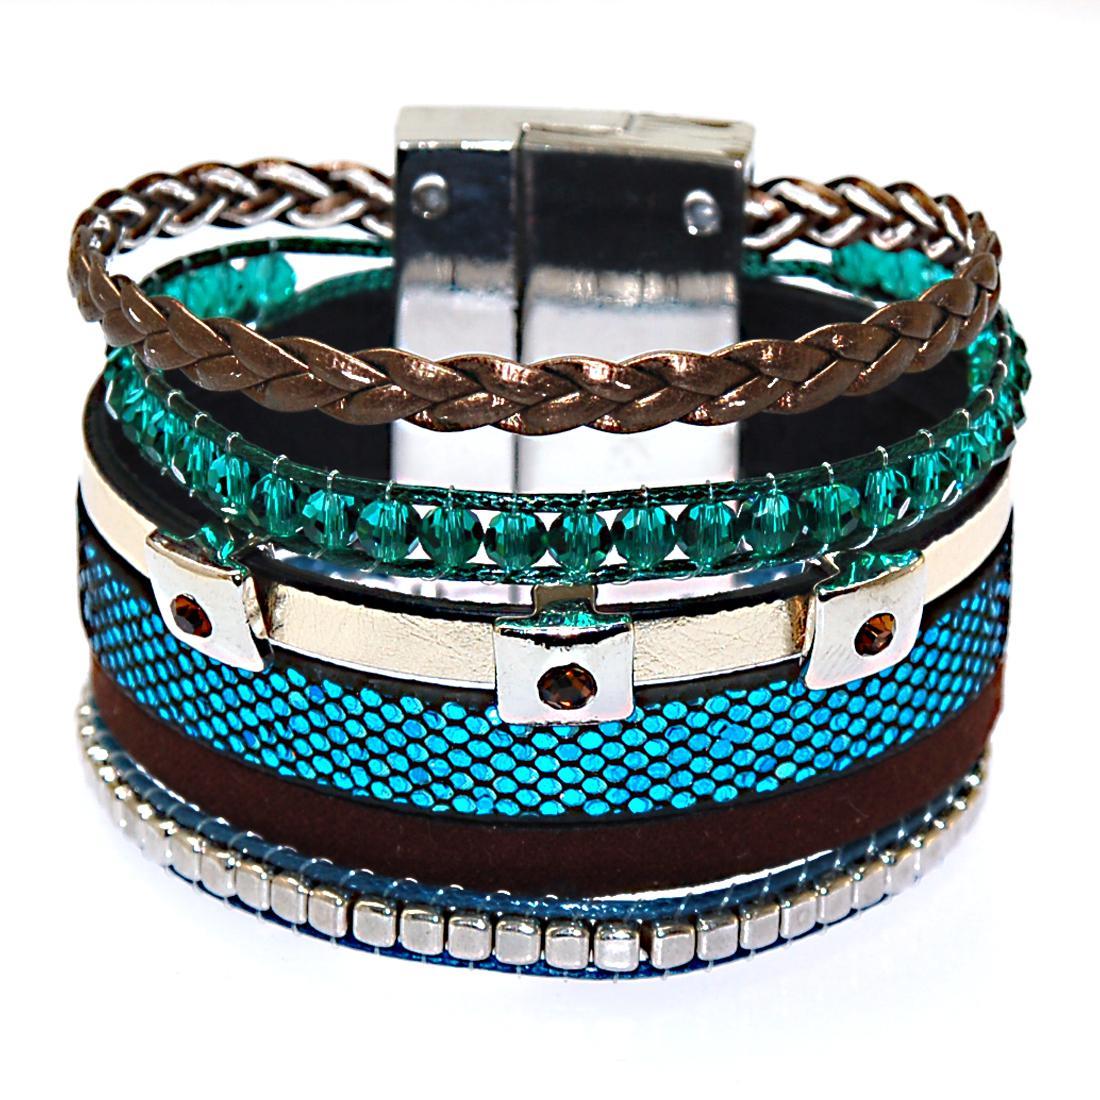 Neueste Ankunft Multilayer Brazilian Style Bunte Leder Magnetic Wrap Armband mit Kristall